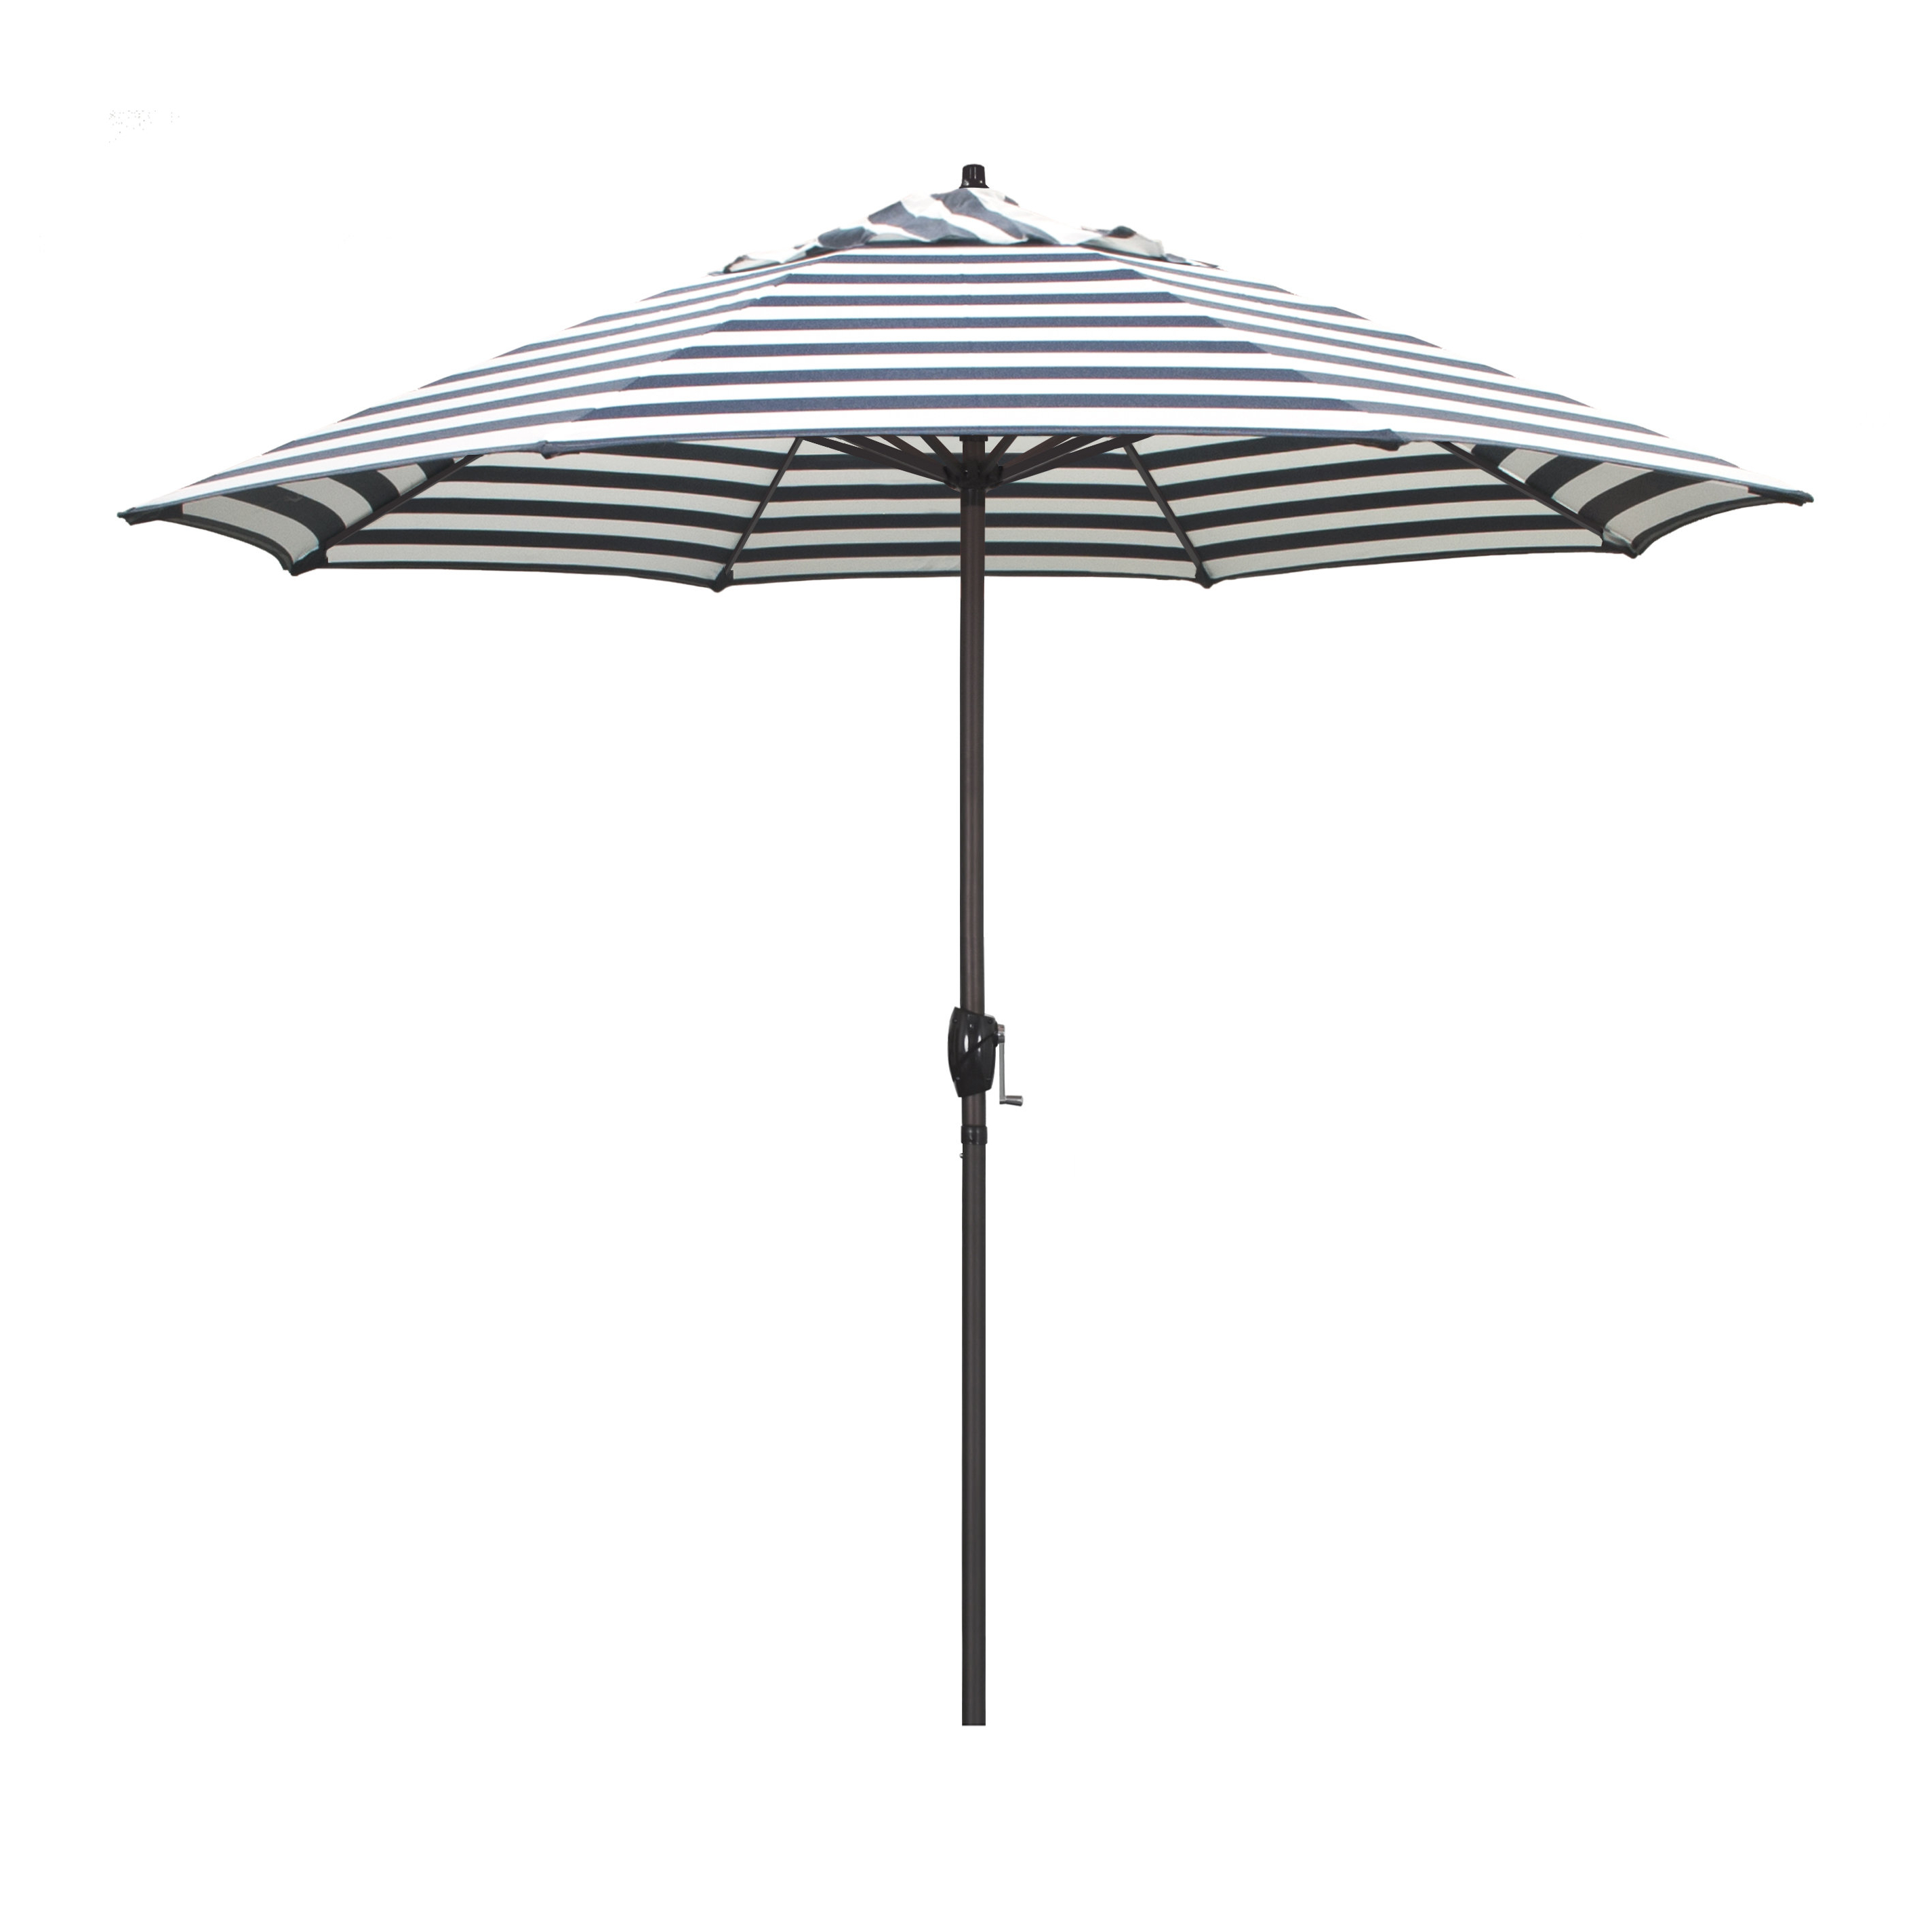 Well Known Artrip Market Umbrellas In Cardine 9' Market Umbrella (View 5 of 20)